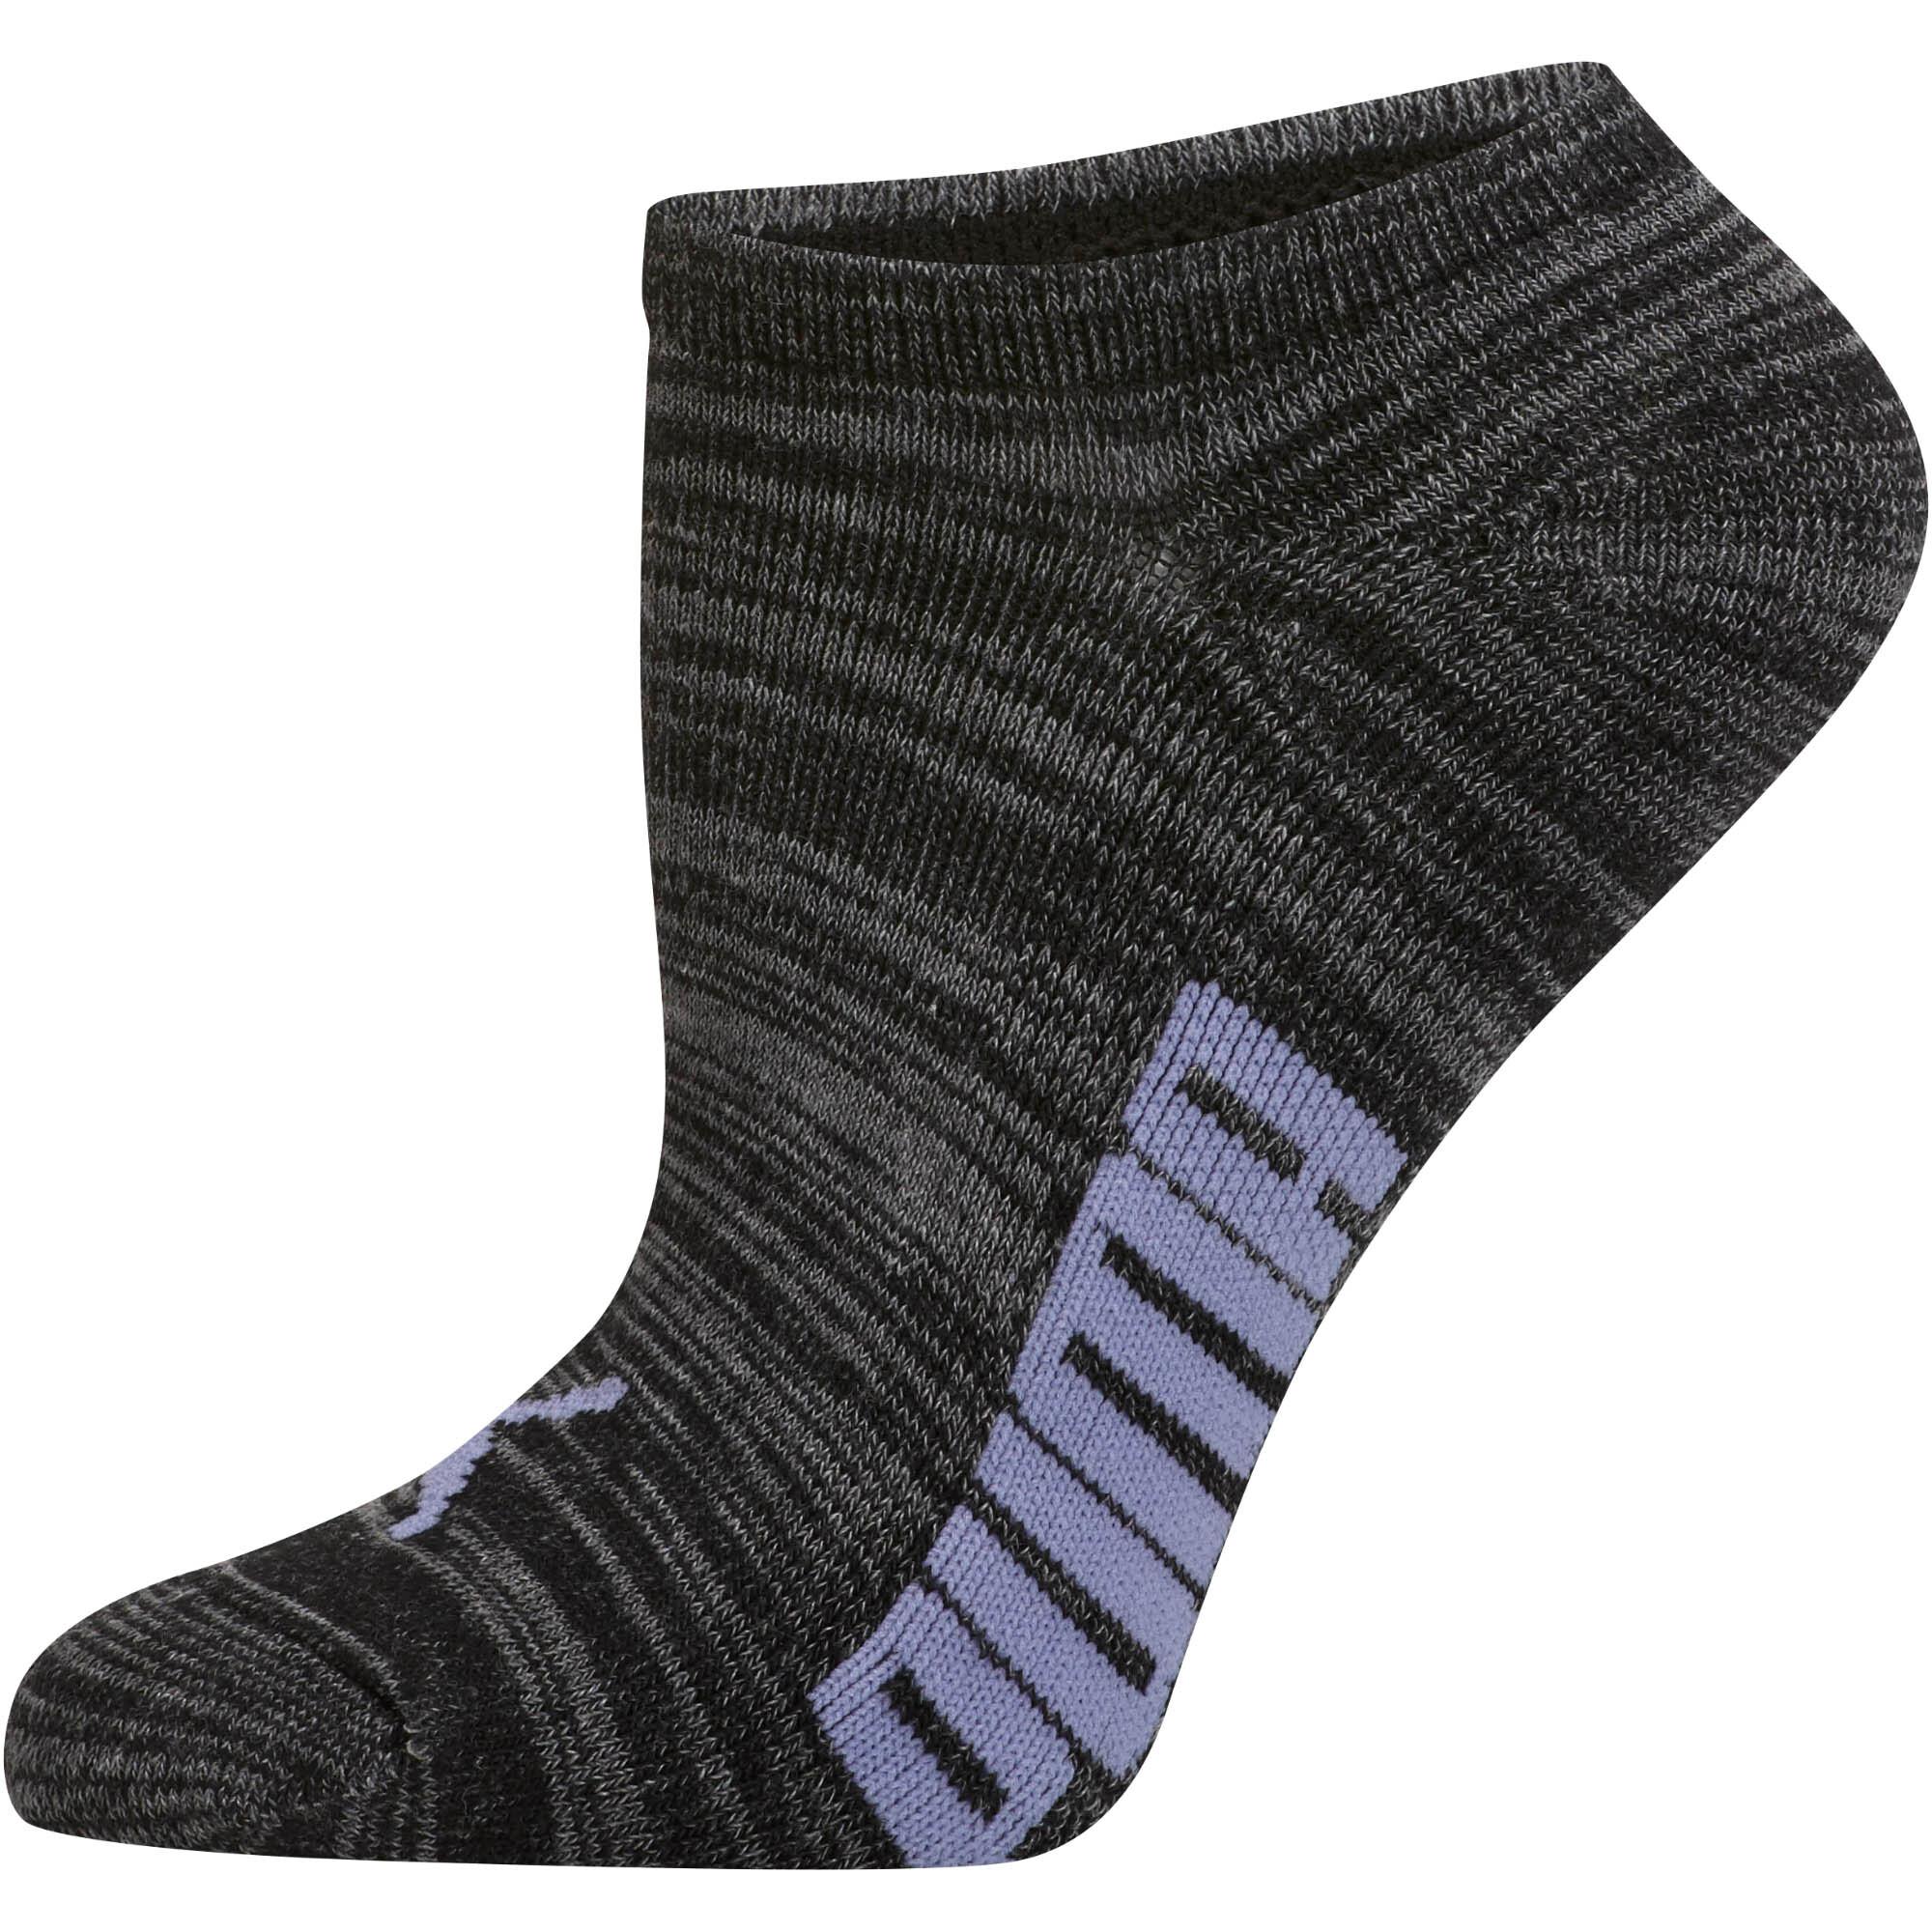 Licence-Women-s-Invisible-No-Show-Socks-3-Pack-Women-Socks-3-Pack thumbnail 7